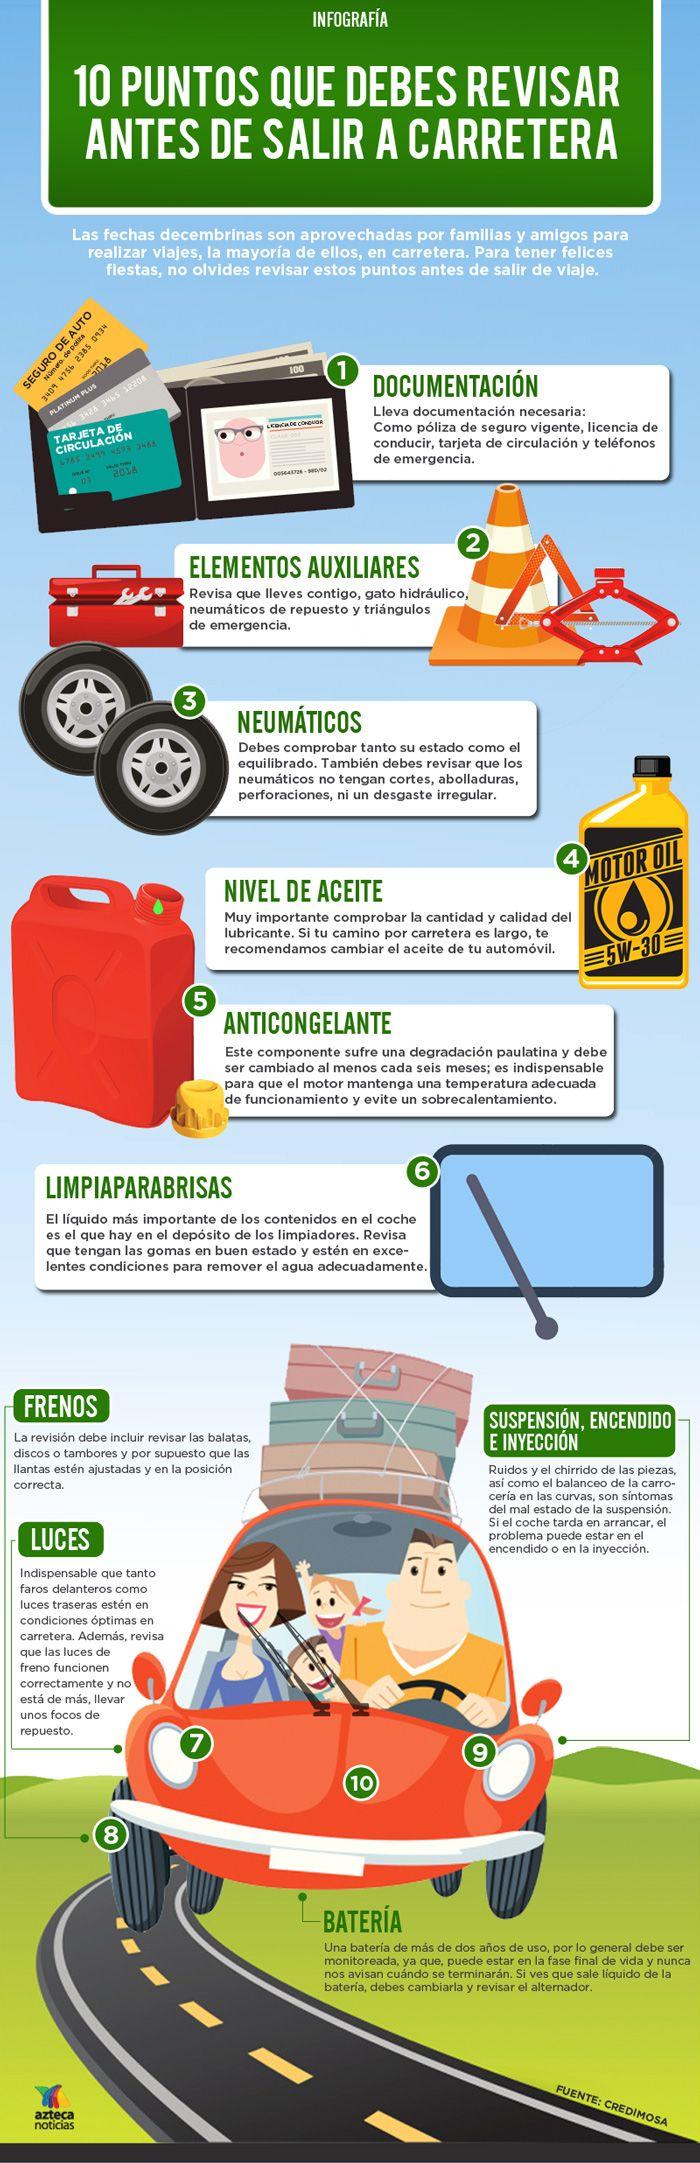 10 puntos que debes revisar antes de salir a carretera #infografia